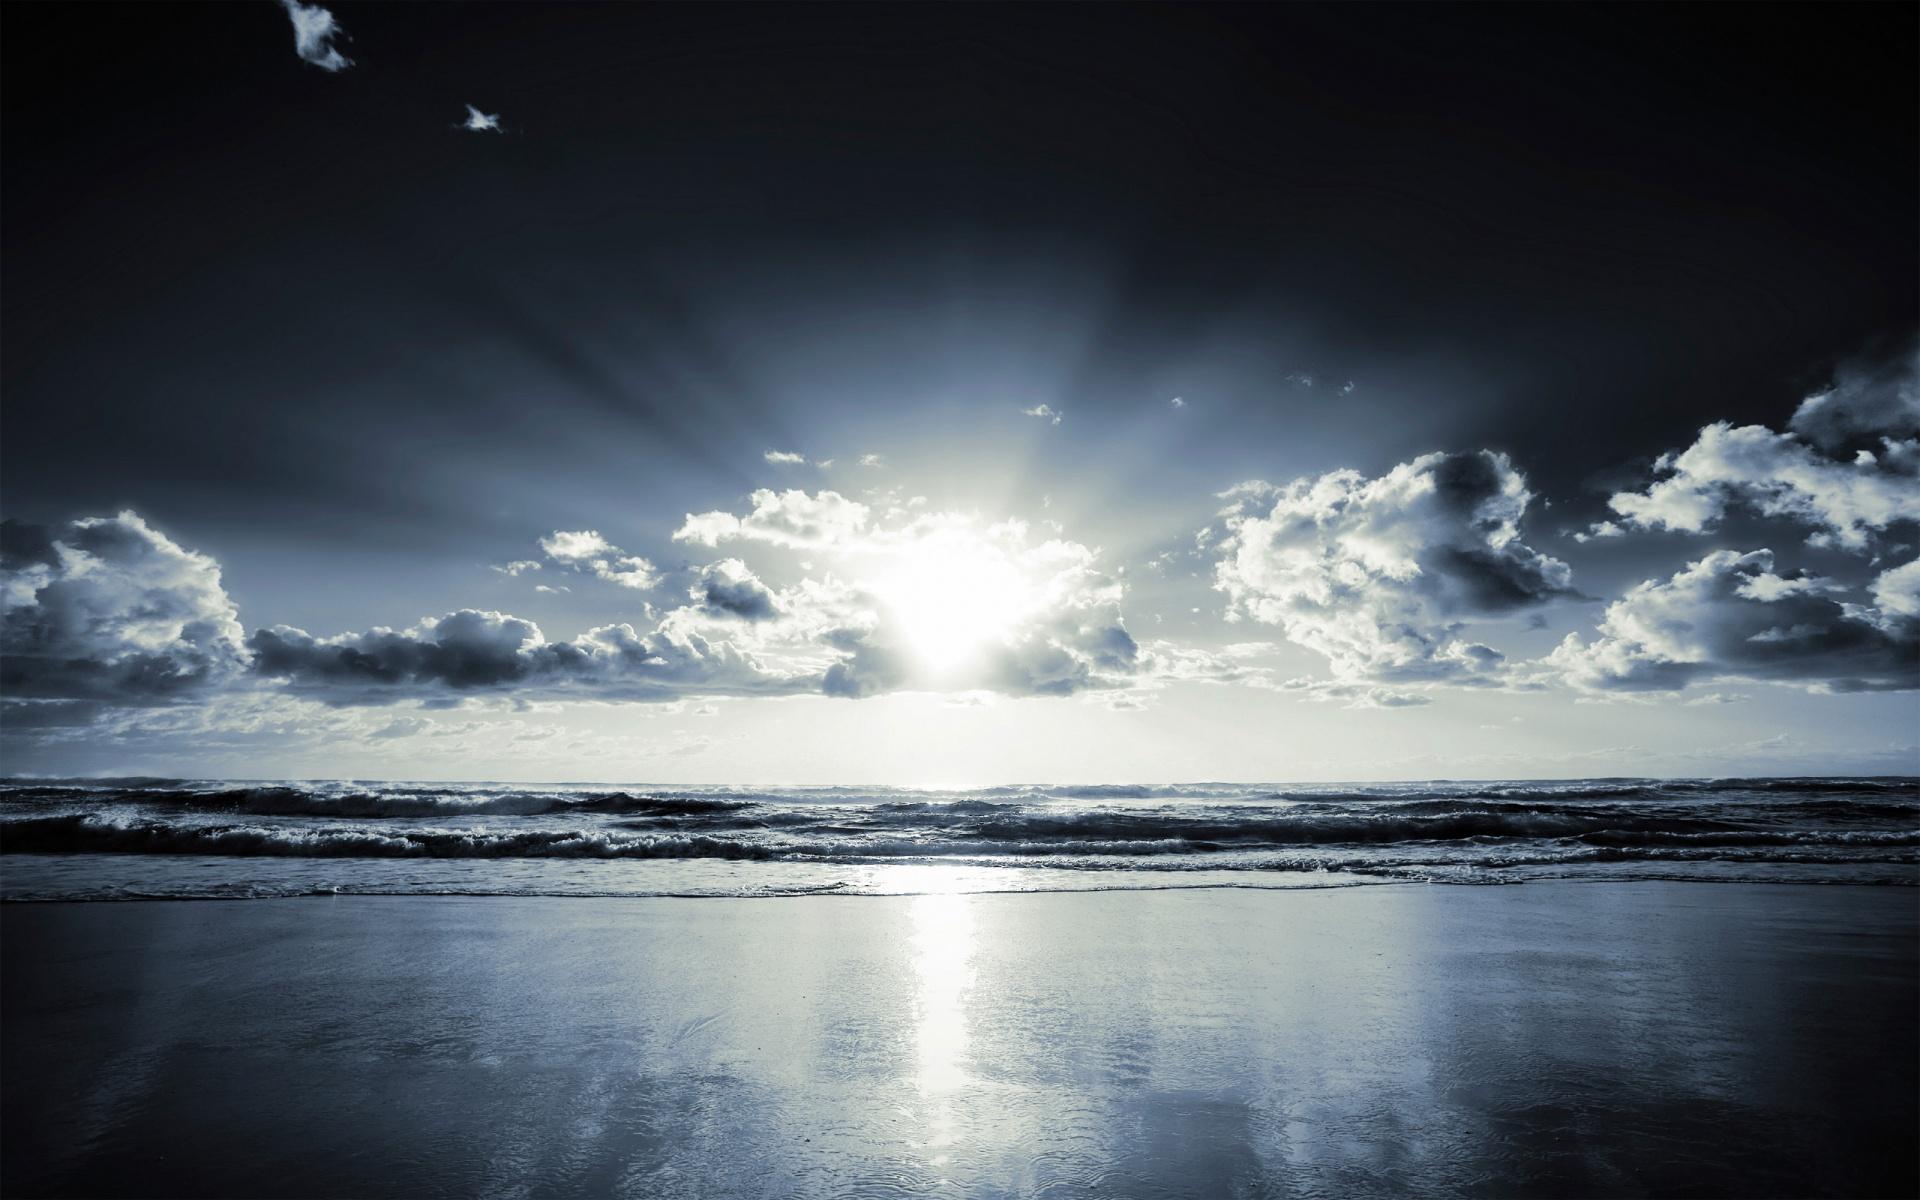 http://stat30fbliss.files.wordpress.com/2010/10/beach_amazing_view_1920x12002.jpg